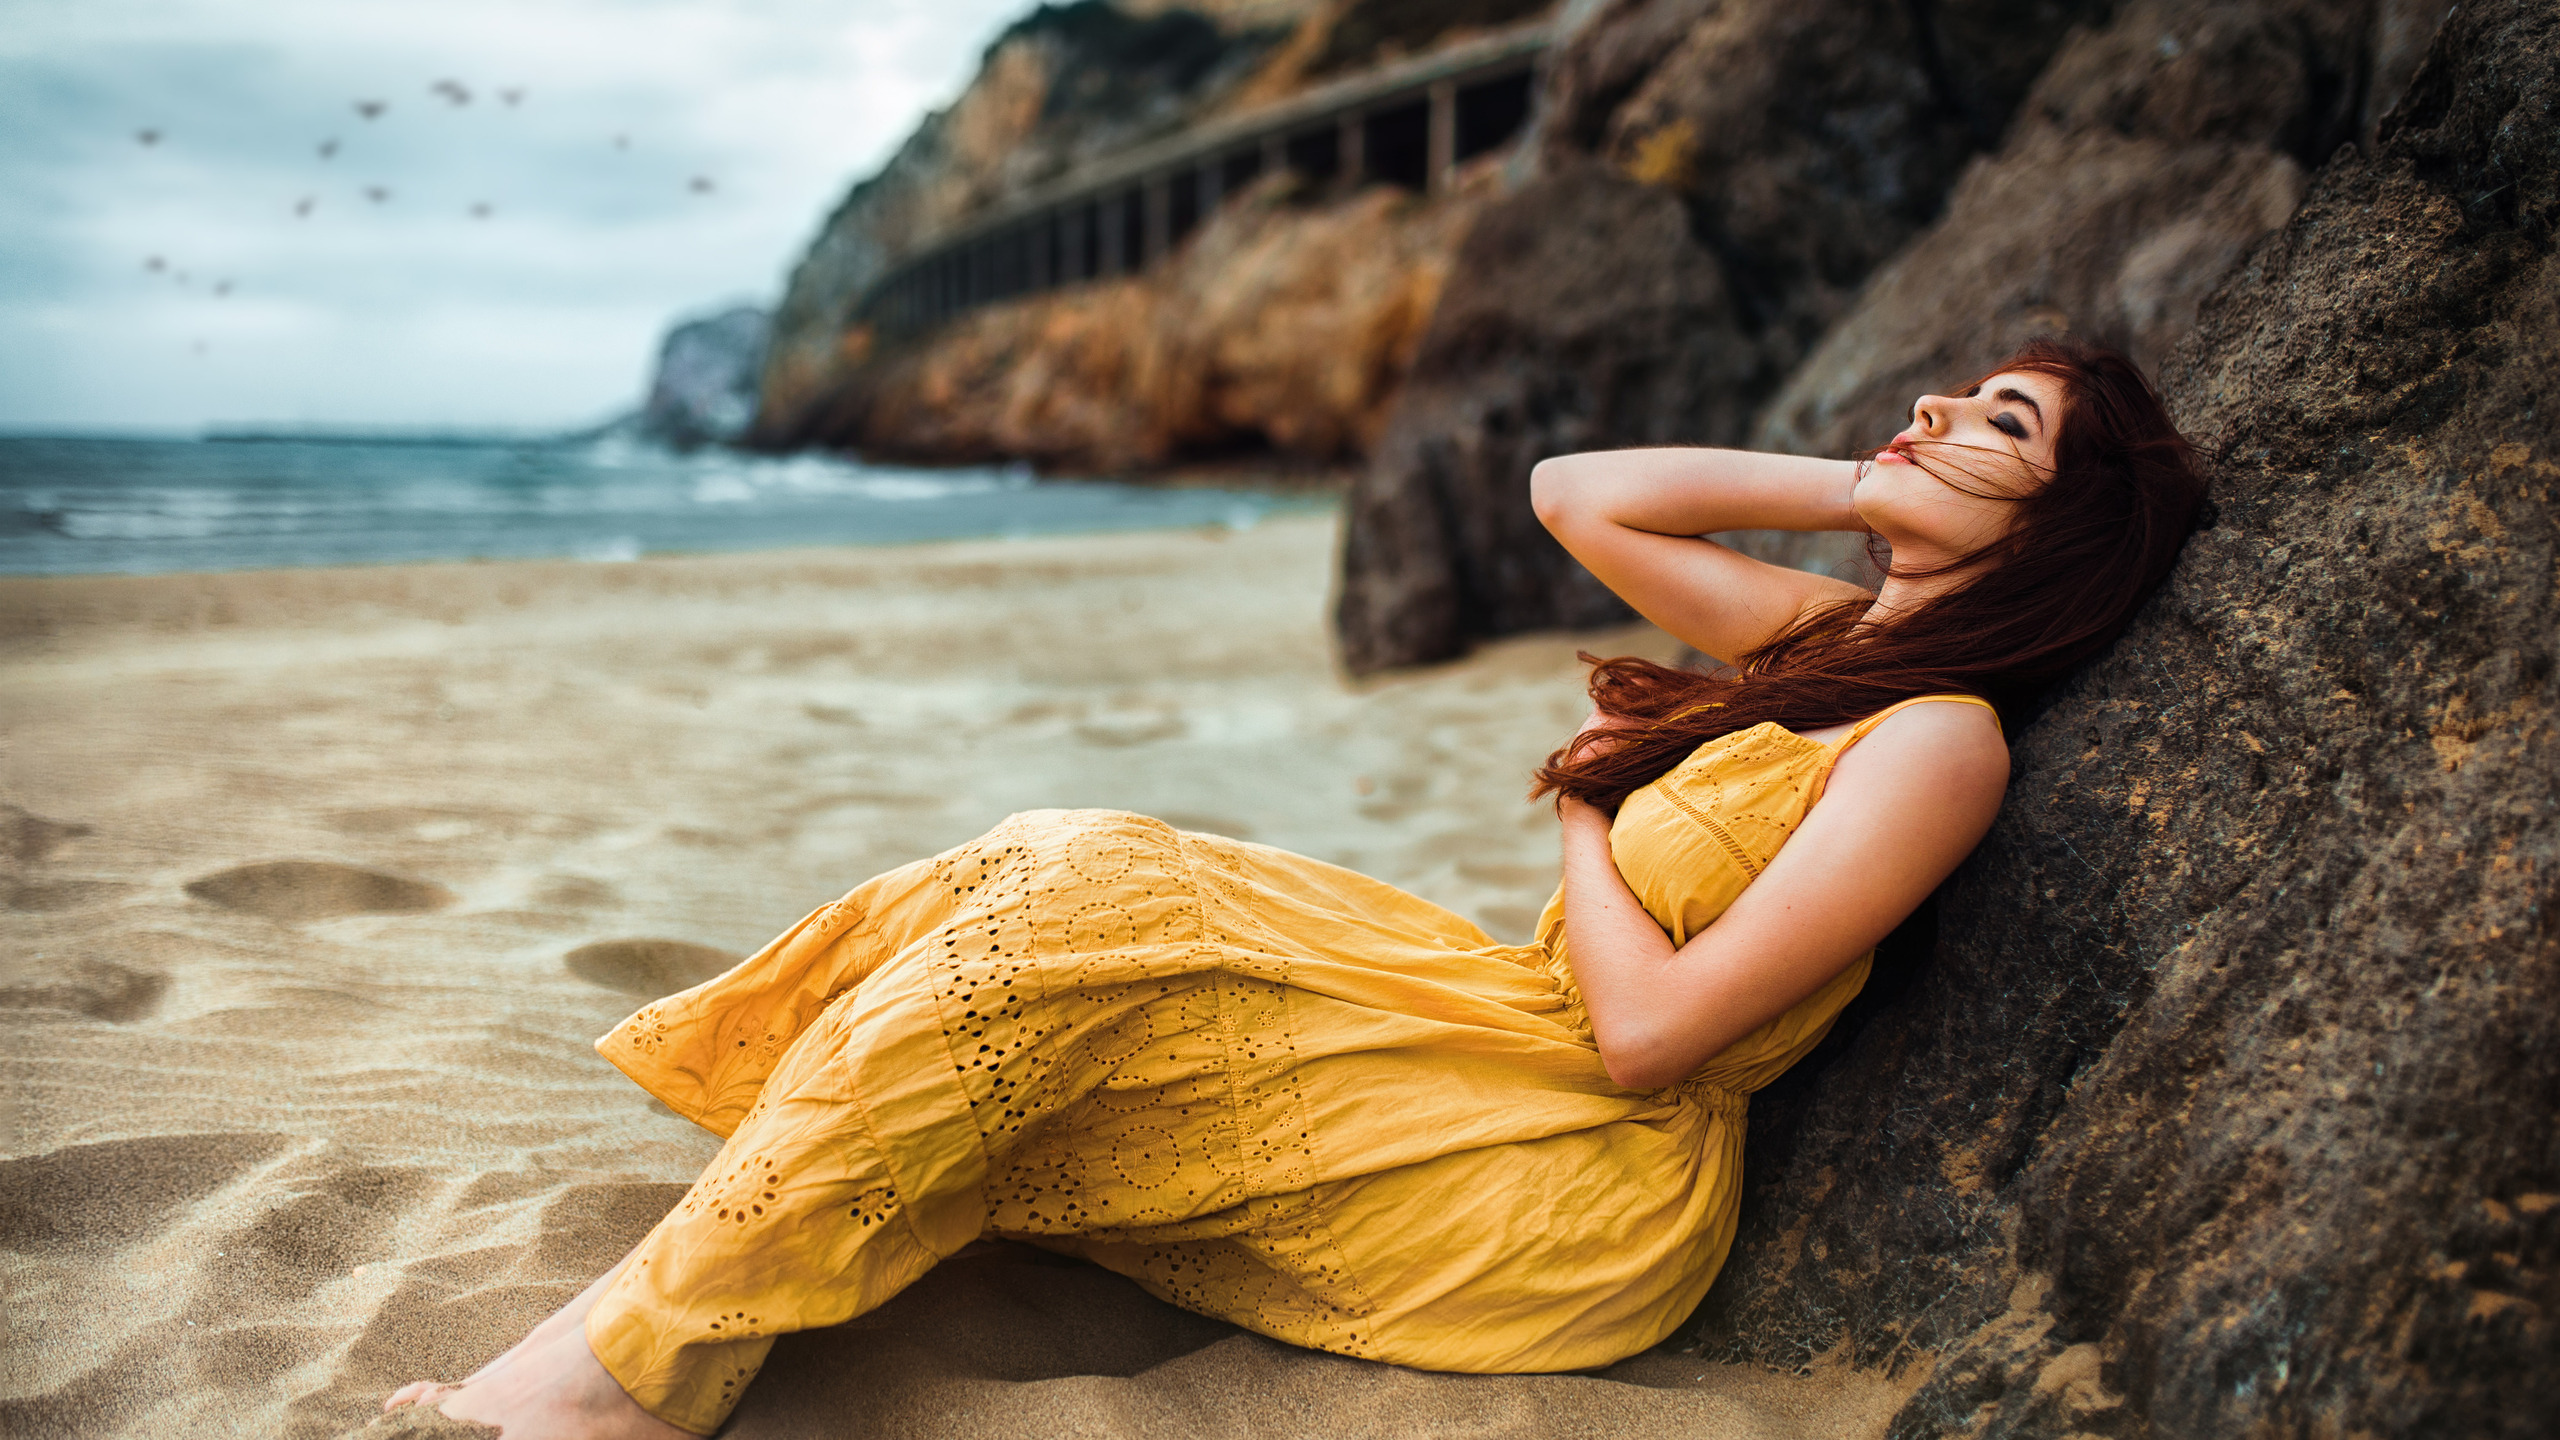 beach-girl-long-hair-relaxing-5k-il.jpg